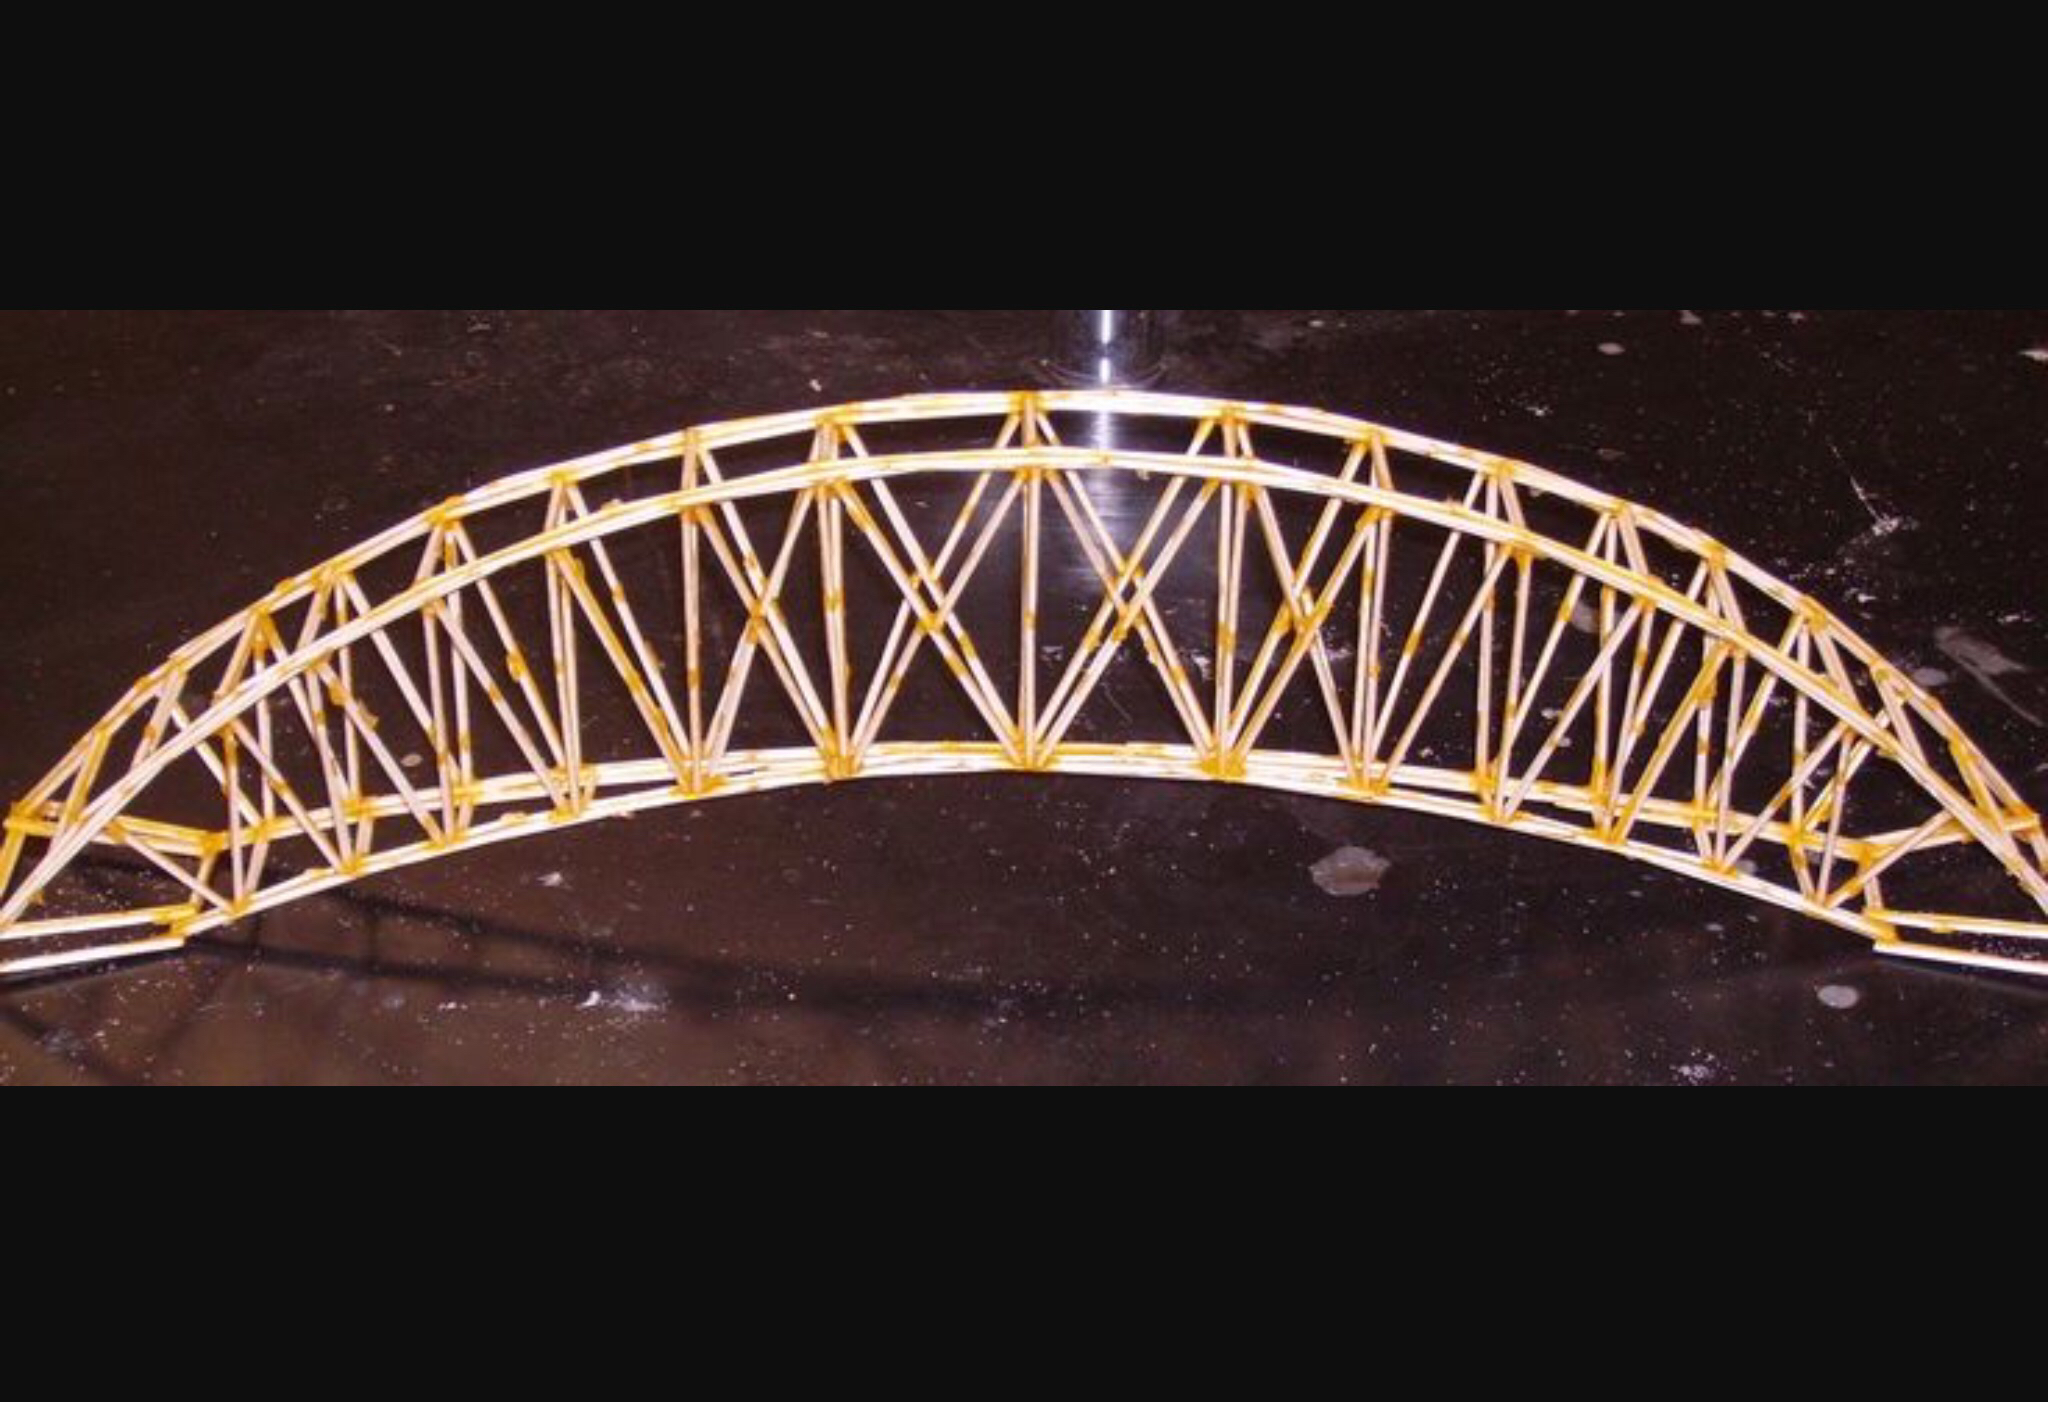 bridge made of toothpicks